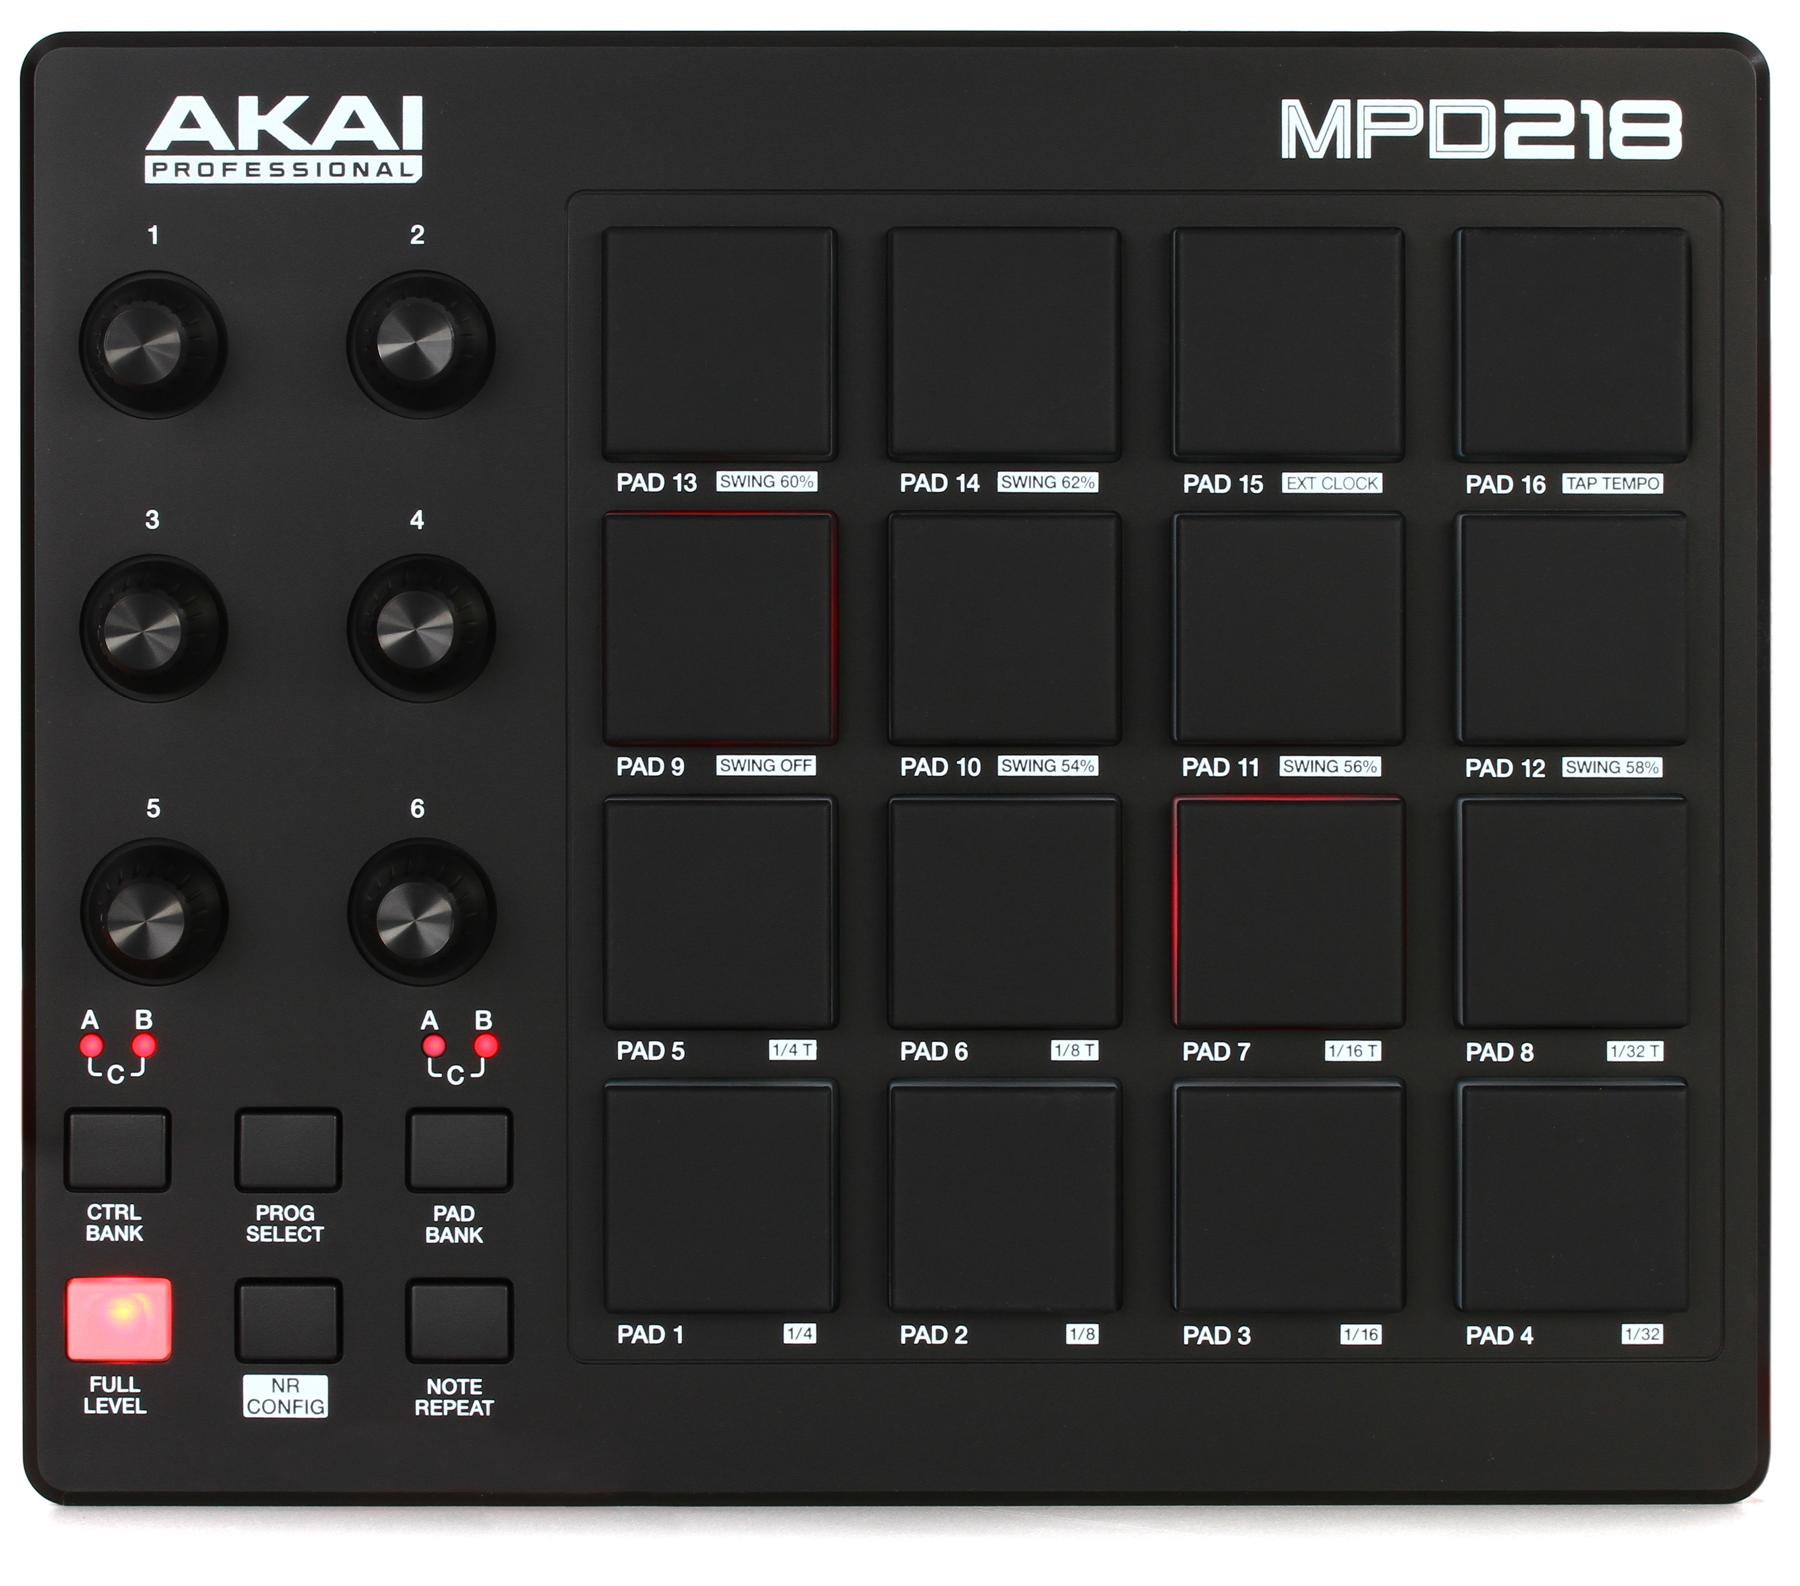 1. Akai Professional MPD218